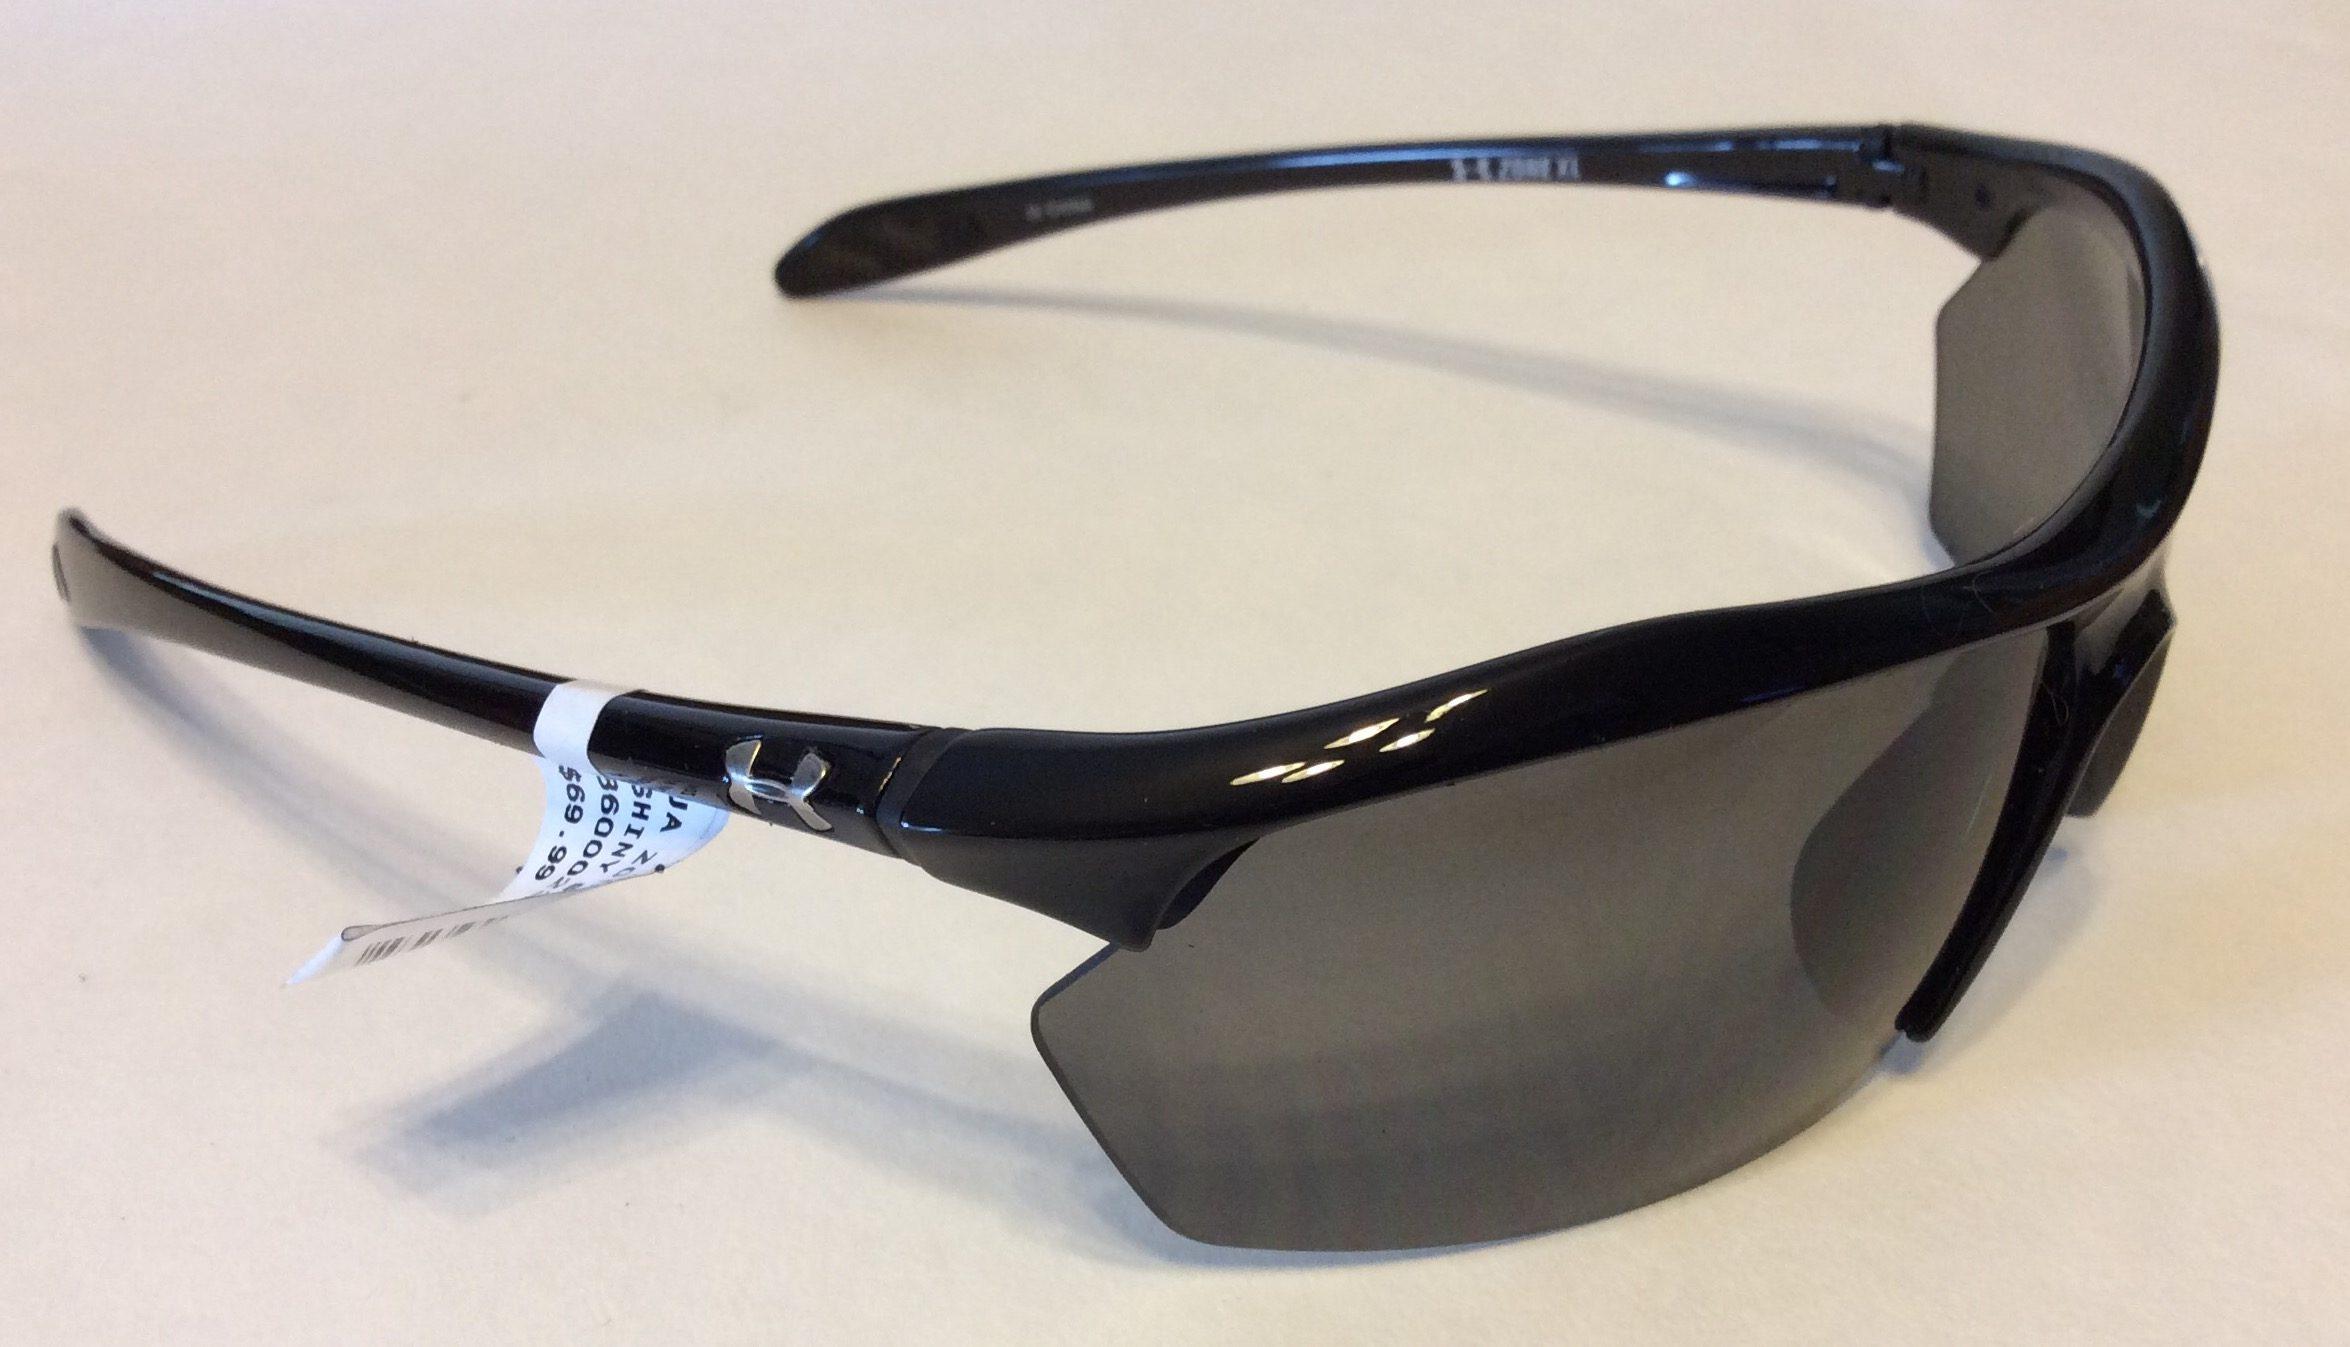 290334d3c3 Under Armour Zone Xl Polarized Sunglasses Reviews « Heritage Malta